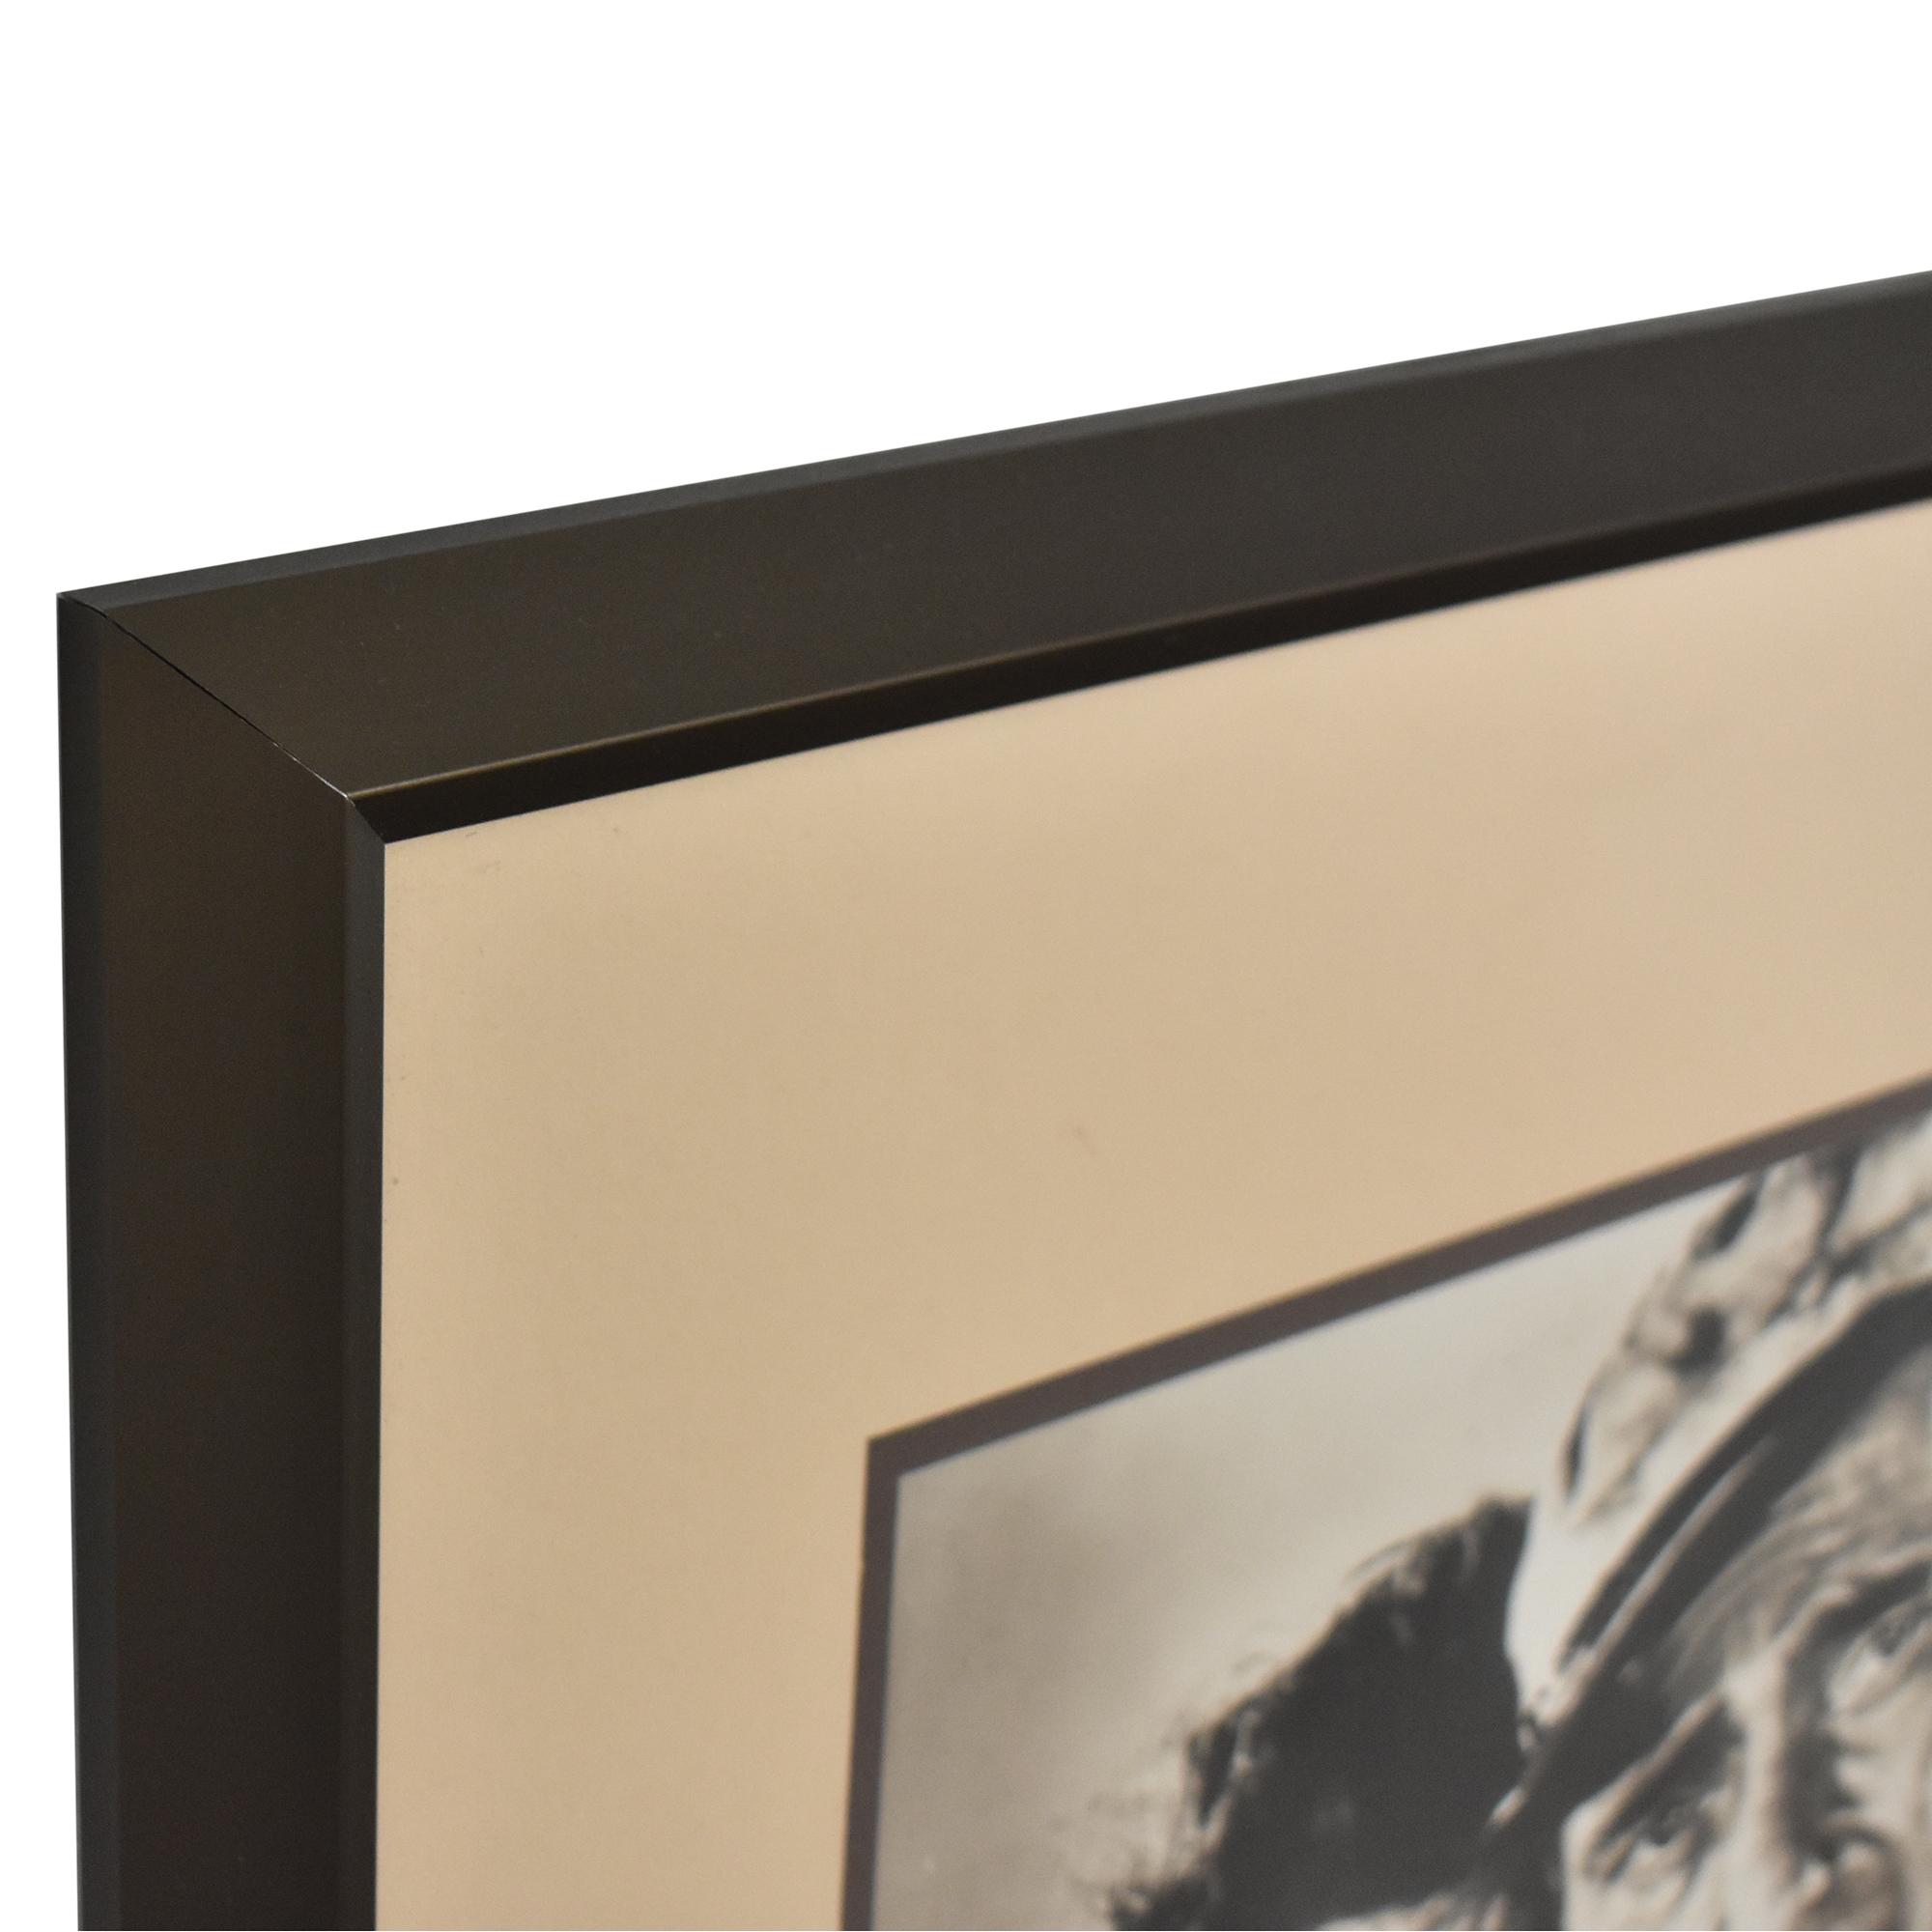 Vintage Bogart and Hepburn Wall Art dark brown & off white